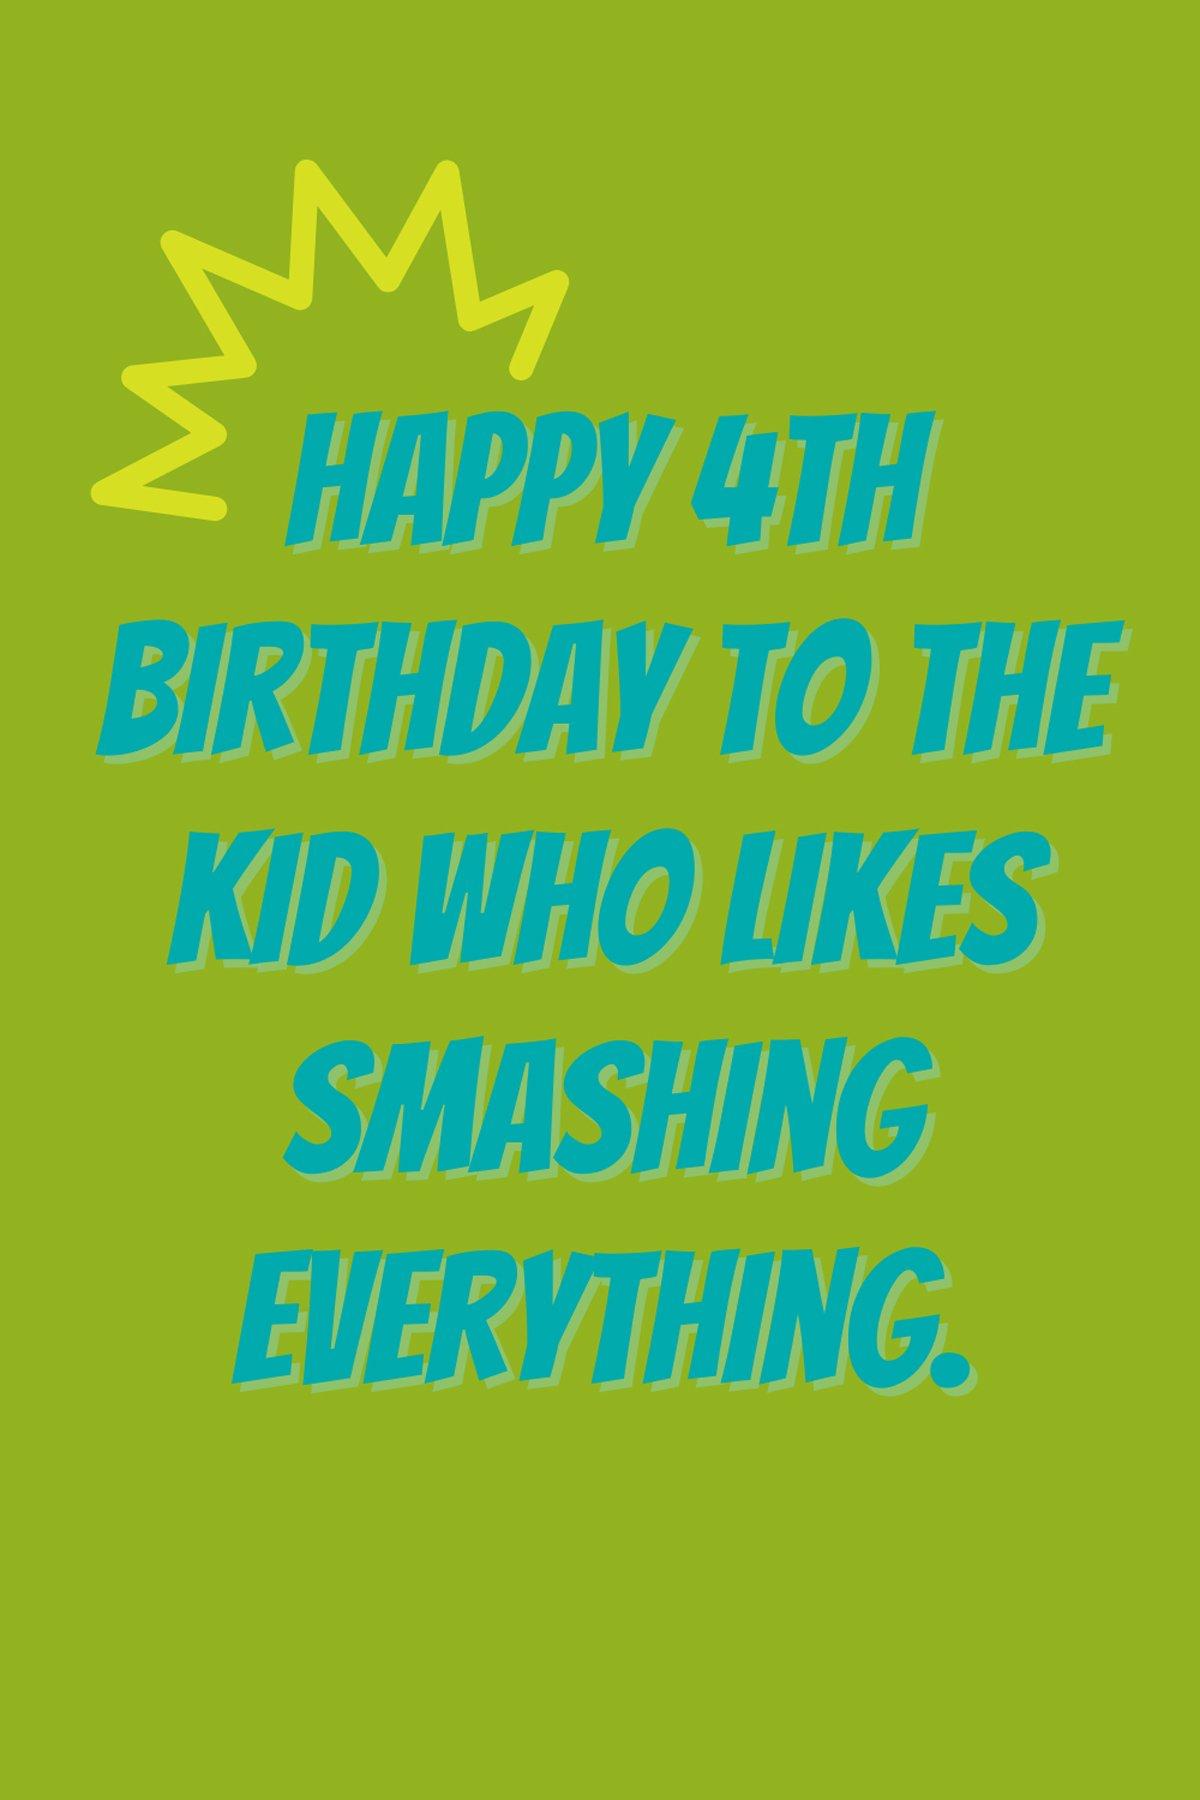 Happy 4th birthday my son quotes